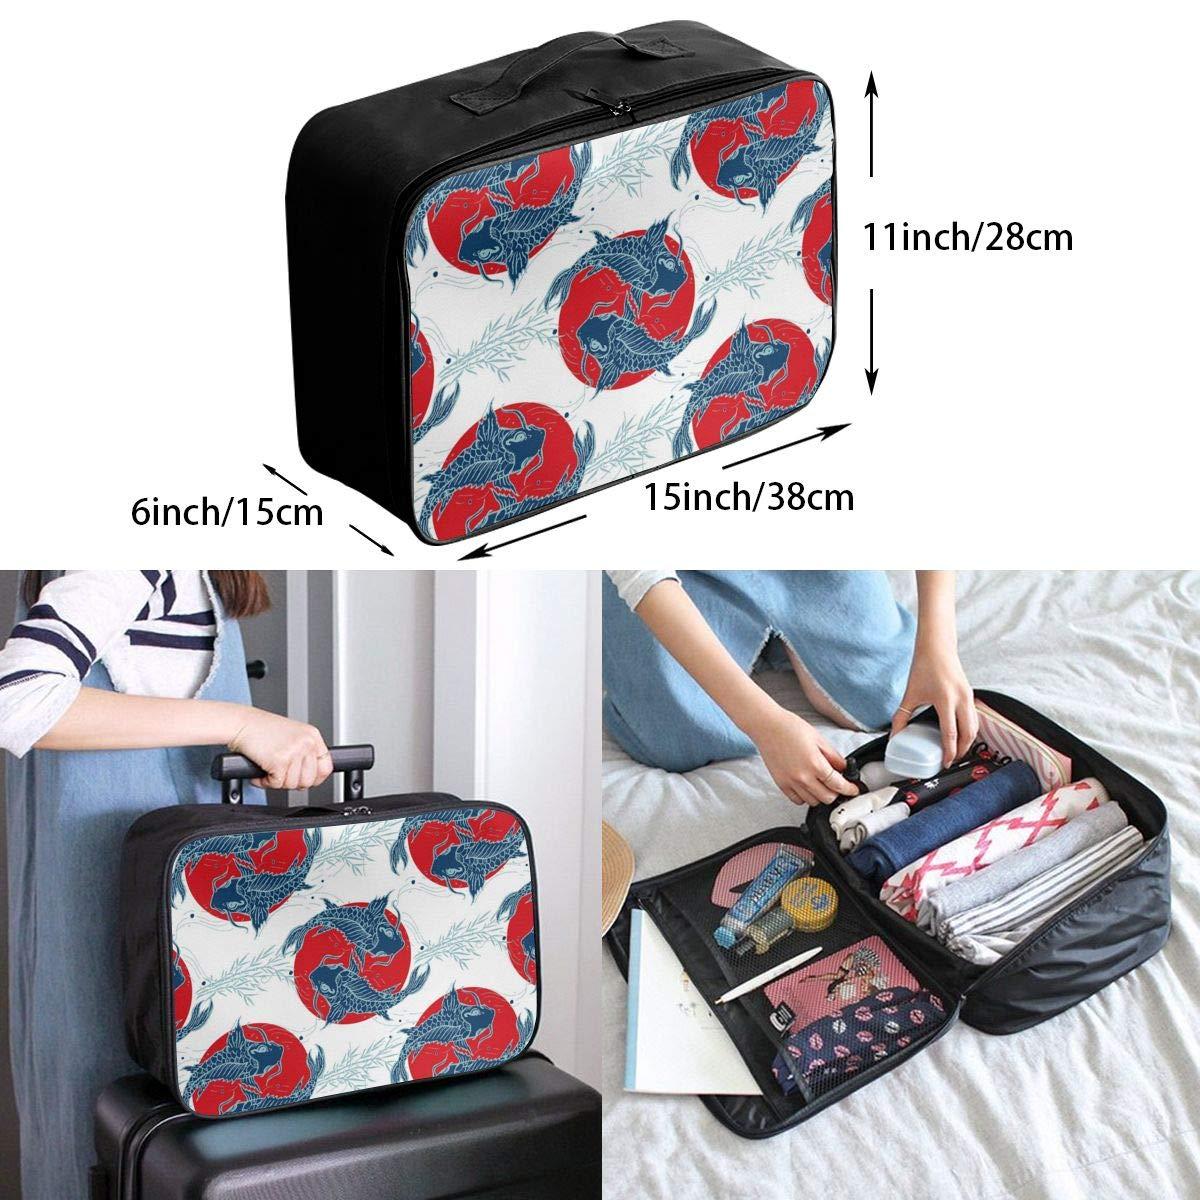 Carp Travel Luggage Storage Bag Duffel Bag Handle Makeup Bag Fashion Lightweight Large Capacity Portable Luggage Bag